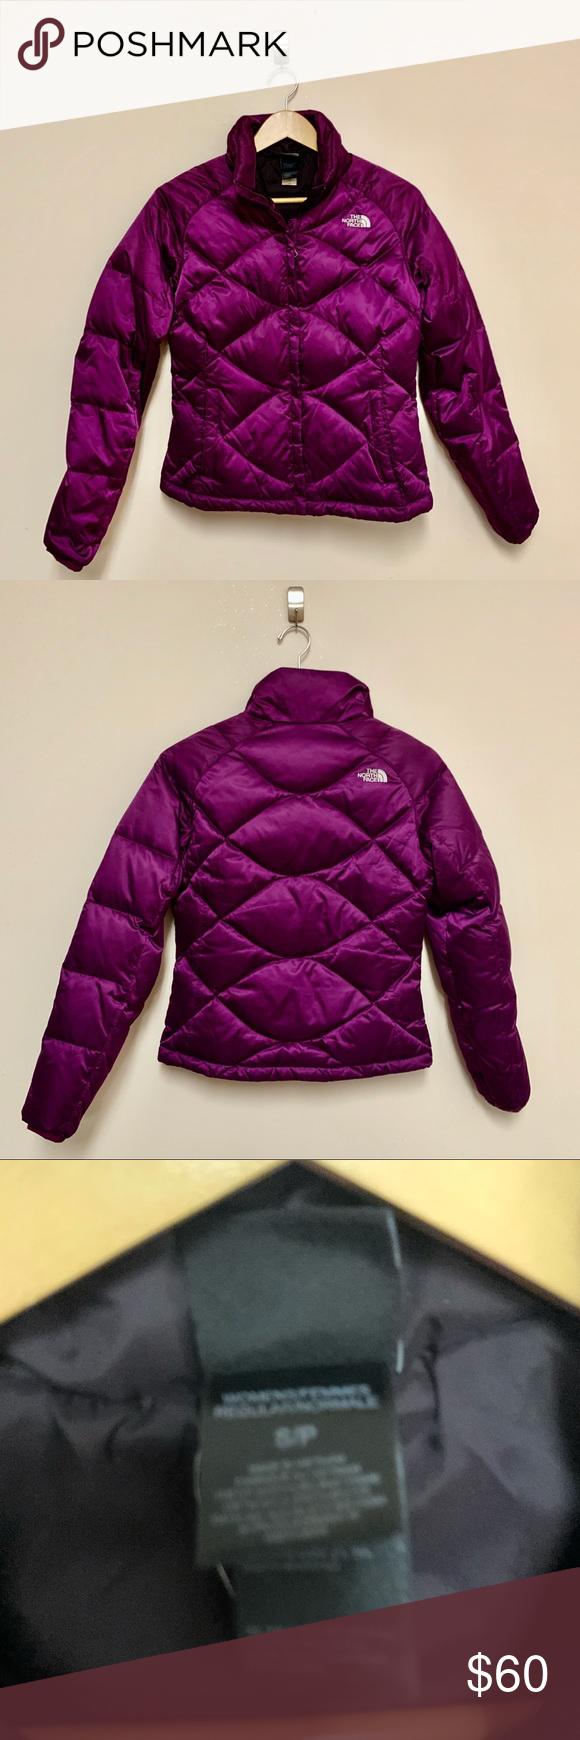 North Face Puffer Down 550 Purple Coat Purple Coat Clothes Design North Face Coat [ 1740 x 580 Pixel ]